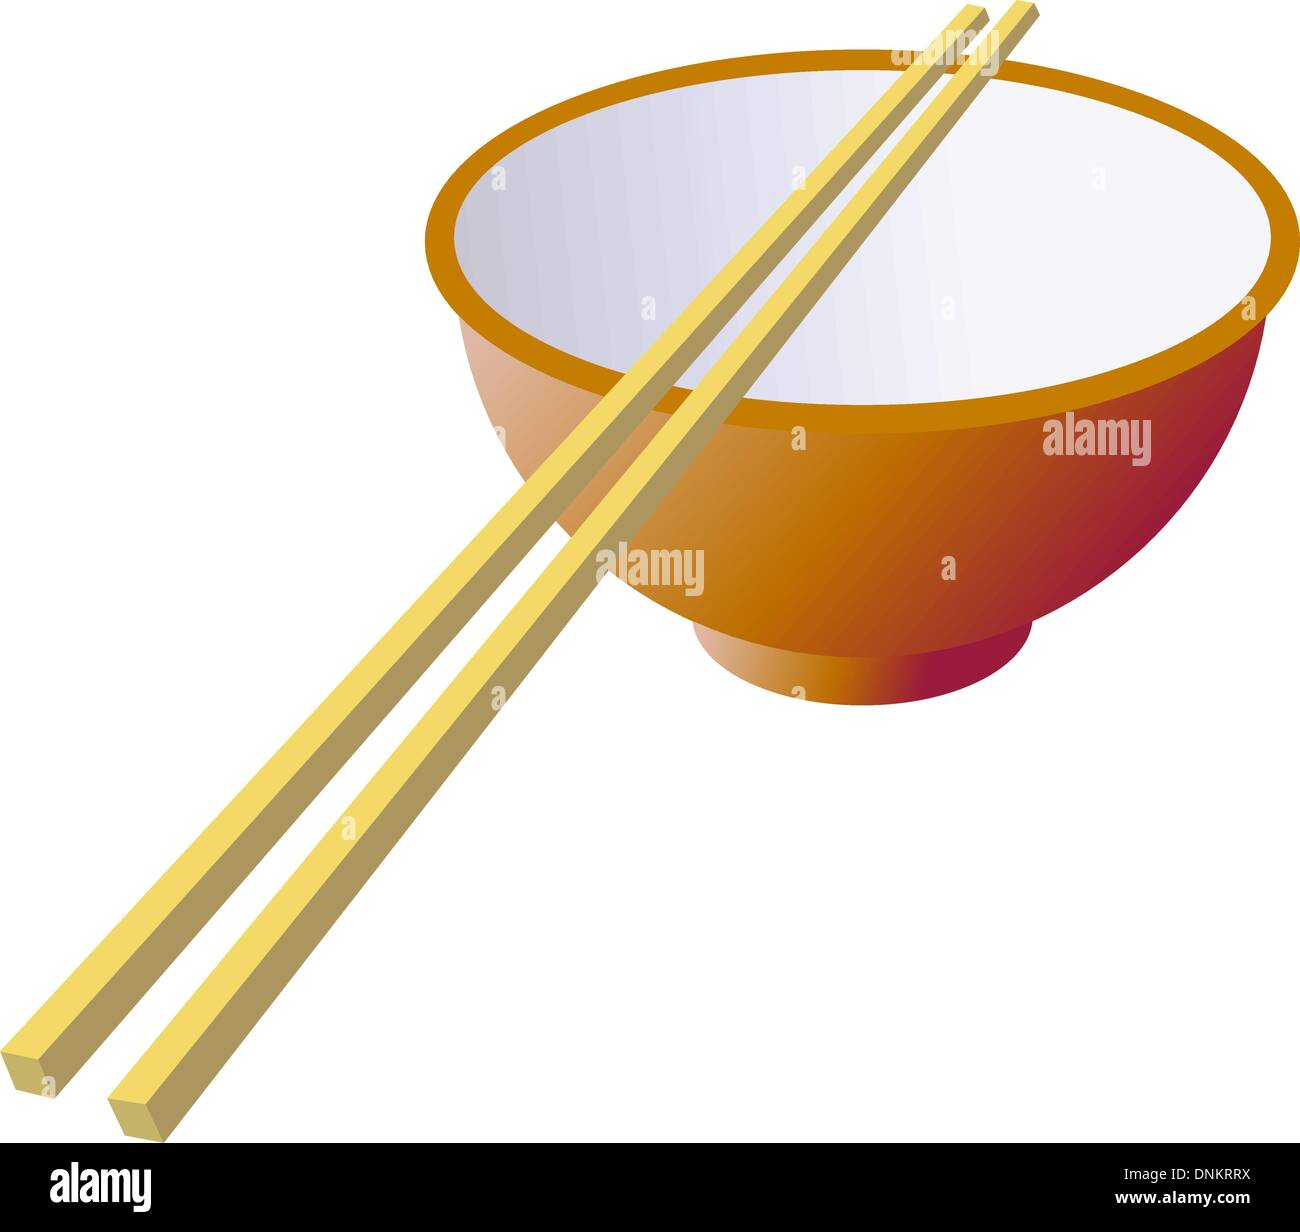 Ceramic mug with wooden sticks. Vector illustration. Stock Vector